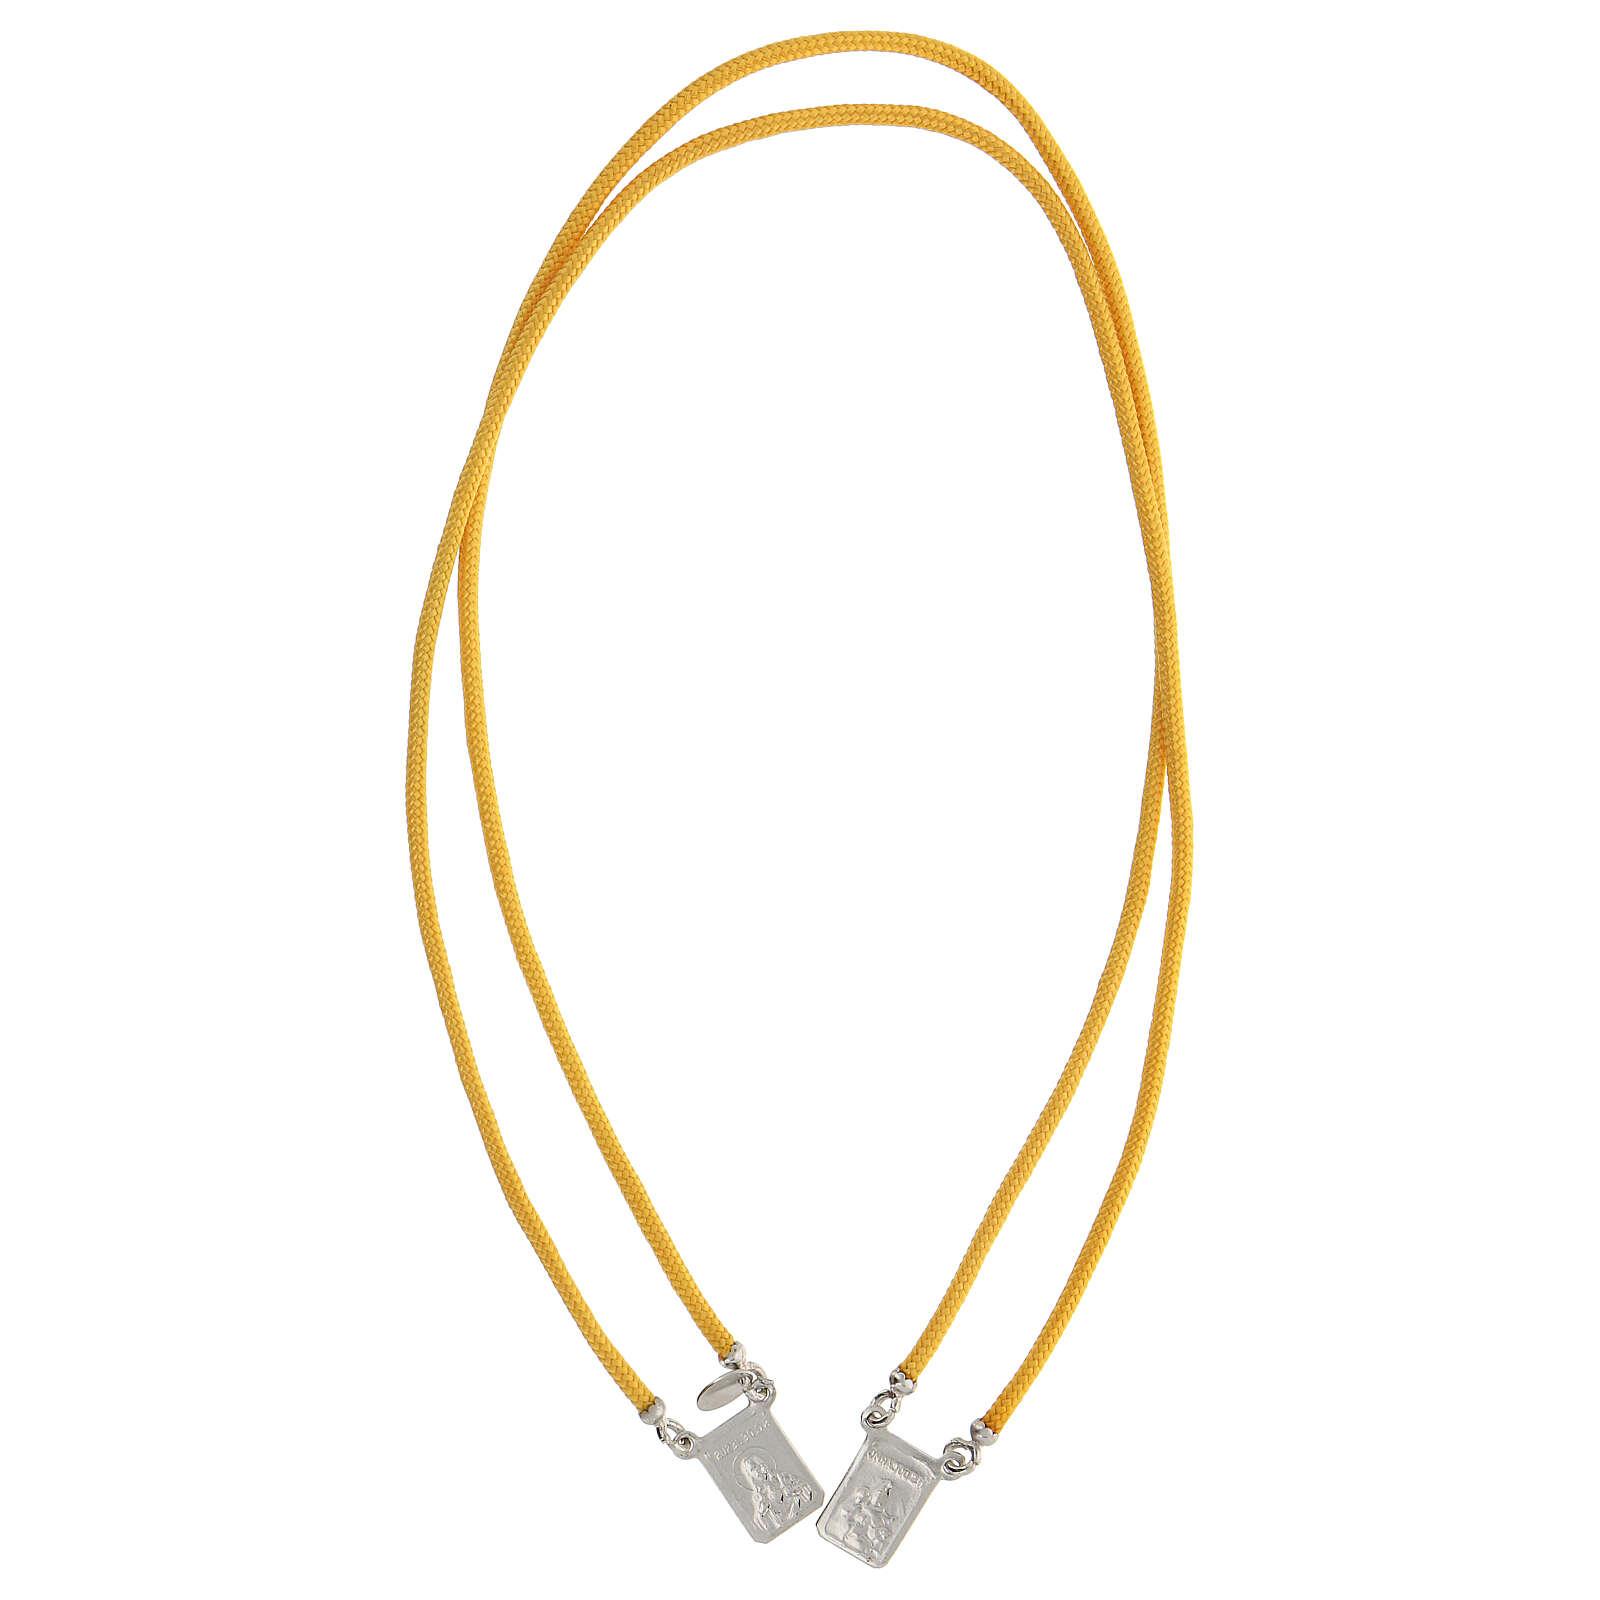 Scapolare argento 925 corda sagola gialla medaglie squadrate 4